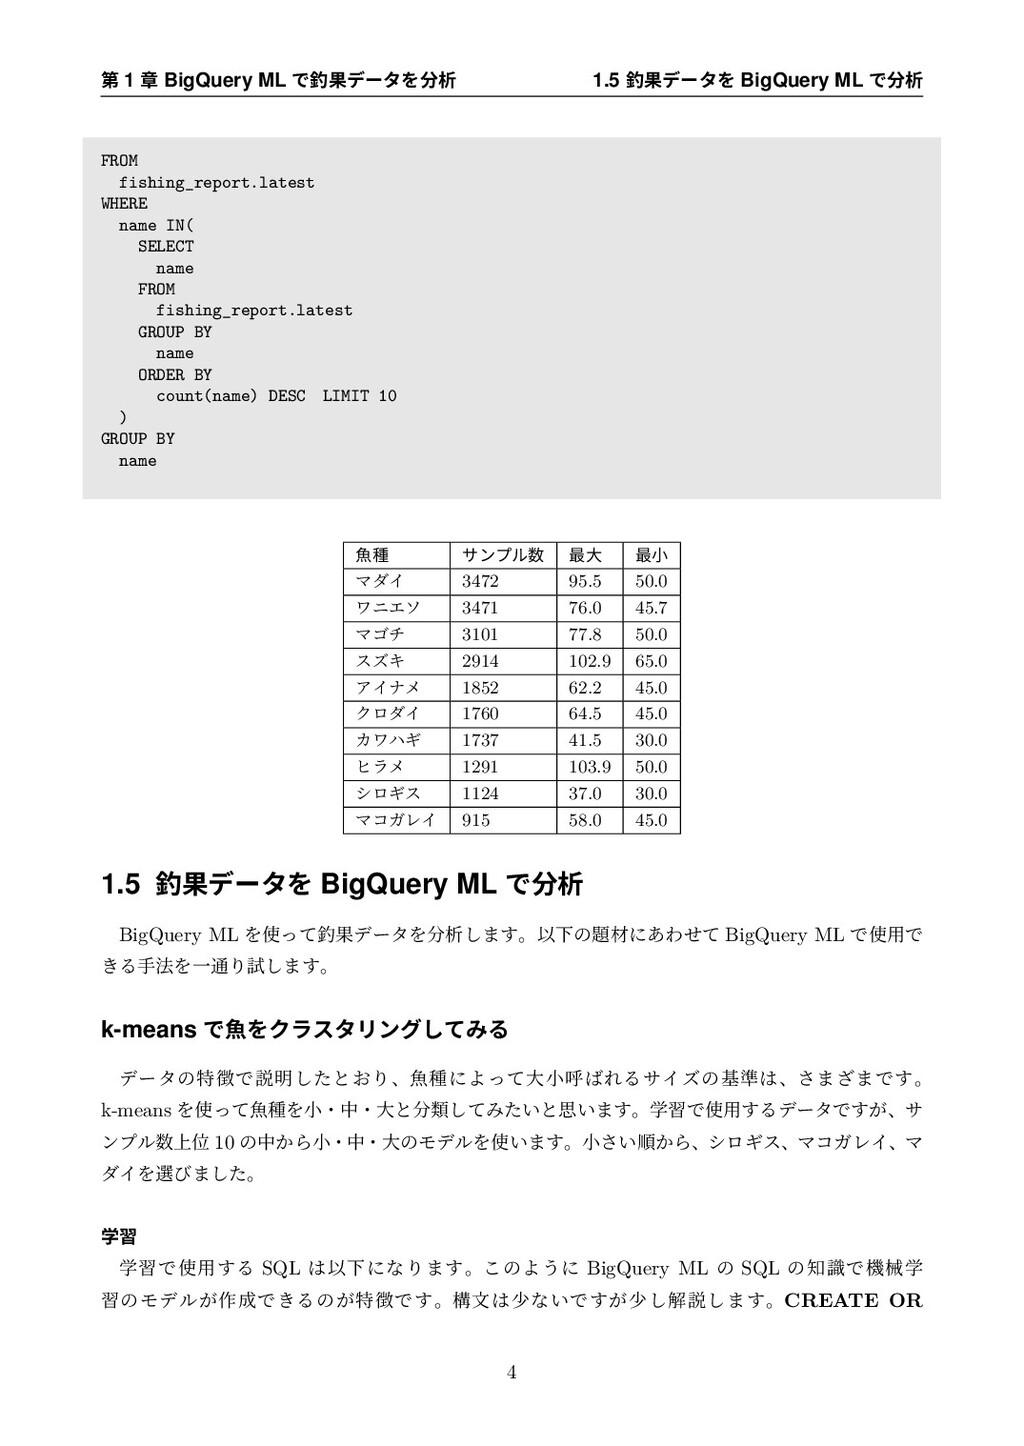 ୈ 1 ষ BigQuery ML ͰՌσʔλΛੳ 1.5 ՌσʔλΛ BigQuery...